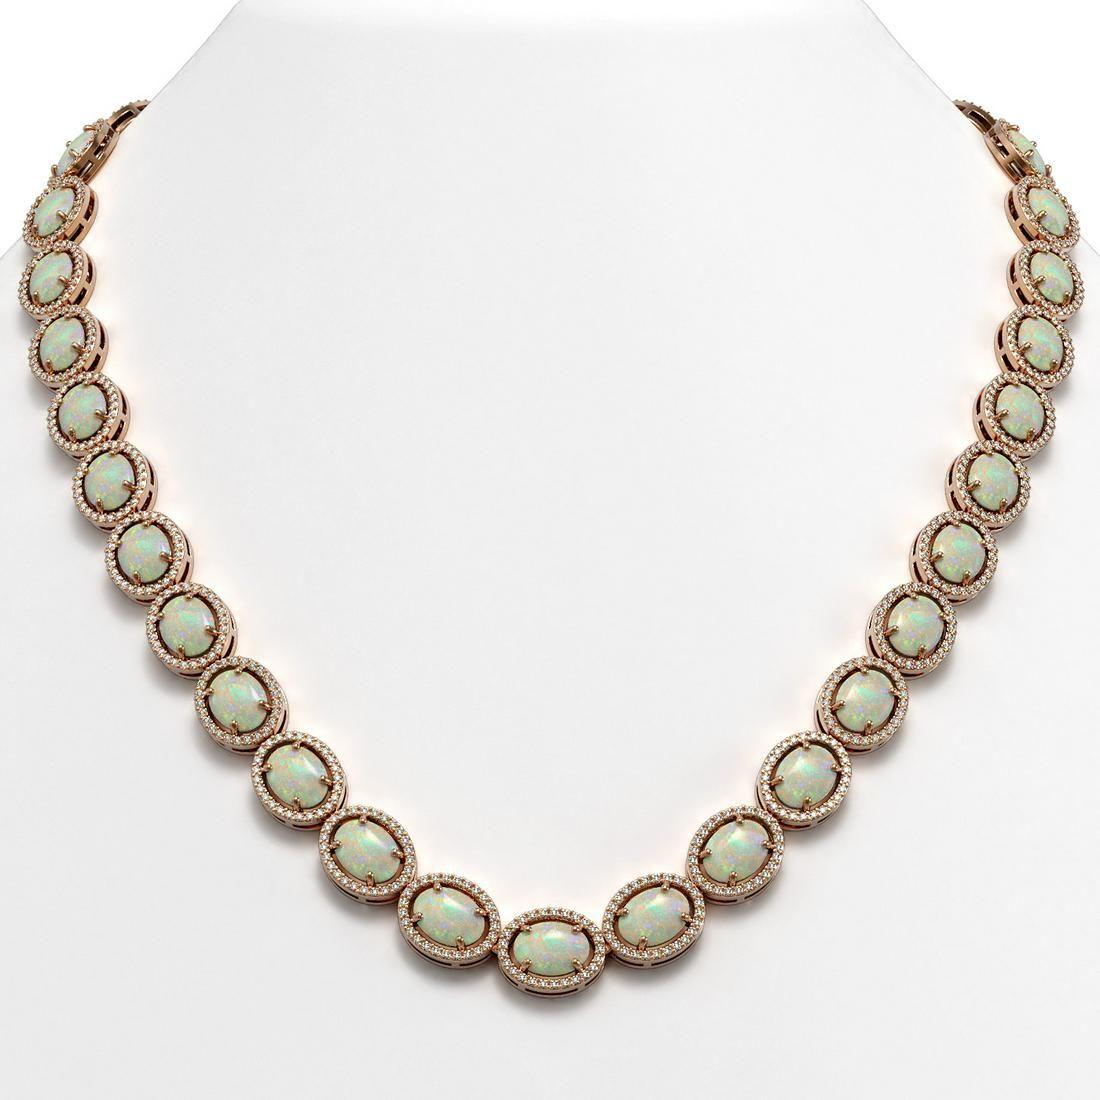 42.29 ctw Opal & Diamond Micro Pave Halo Necklace 10k